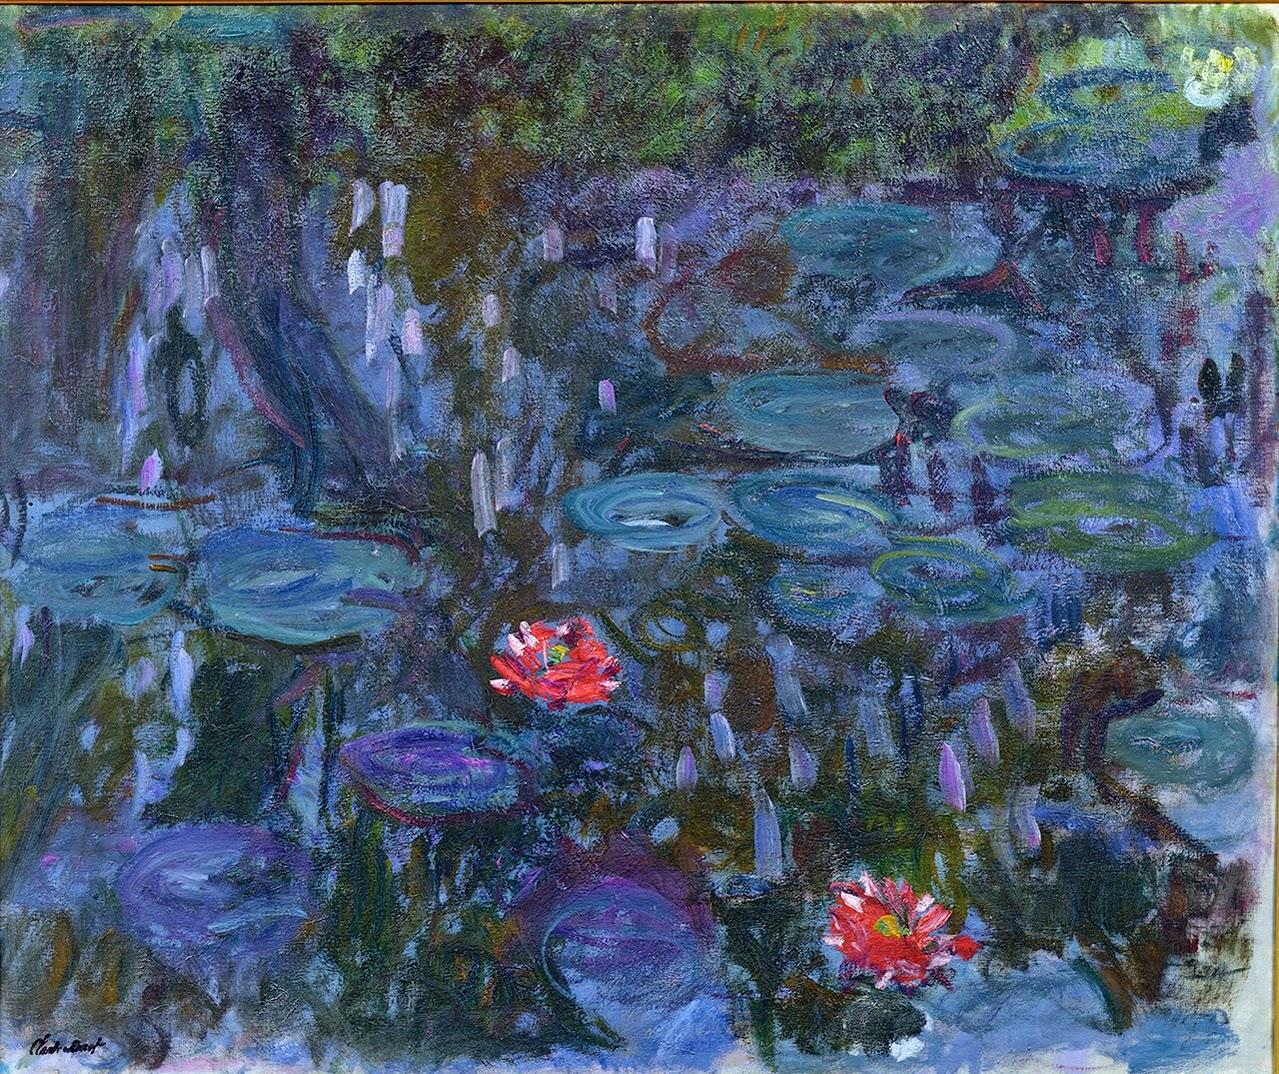 Claude Monet, Ninfee e riflessi del salice